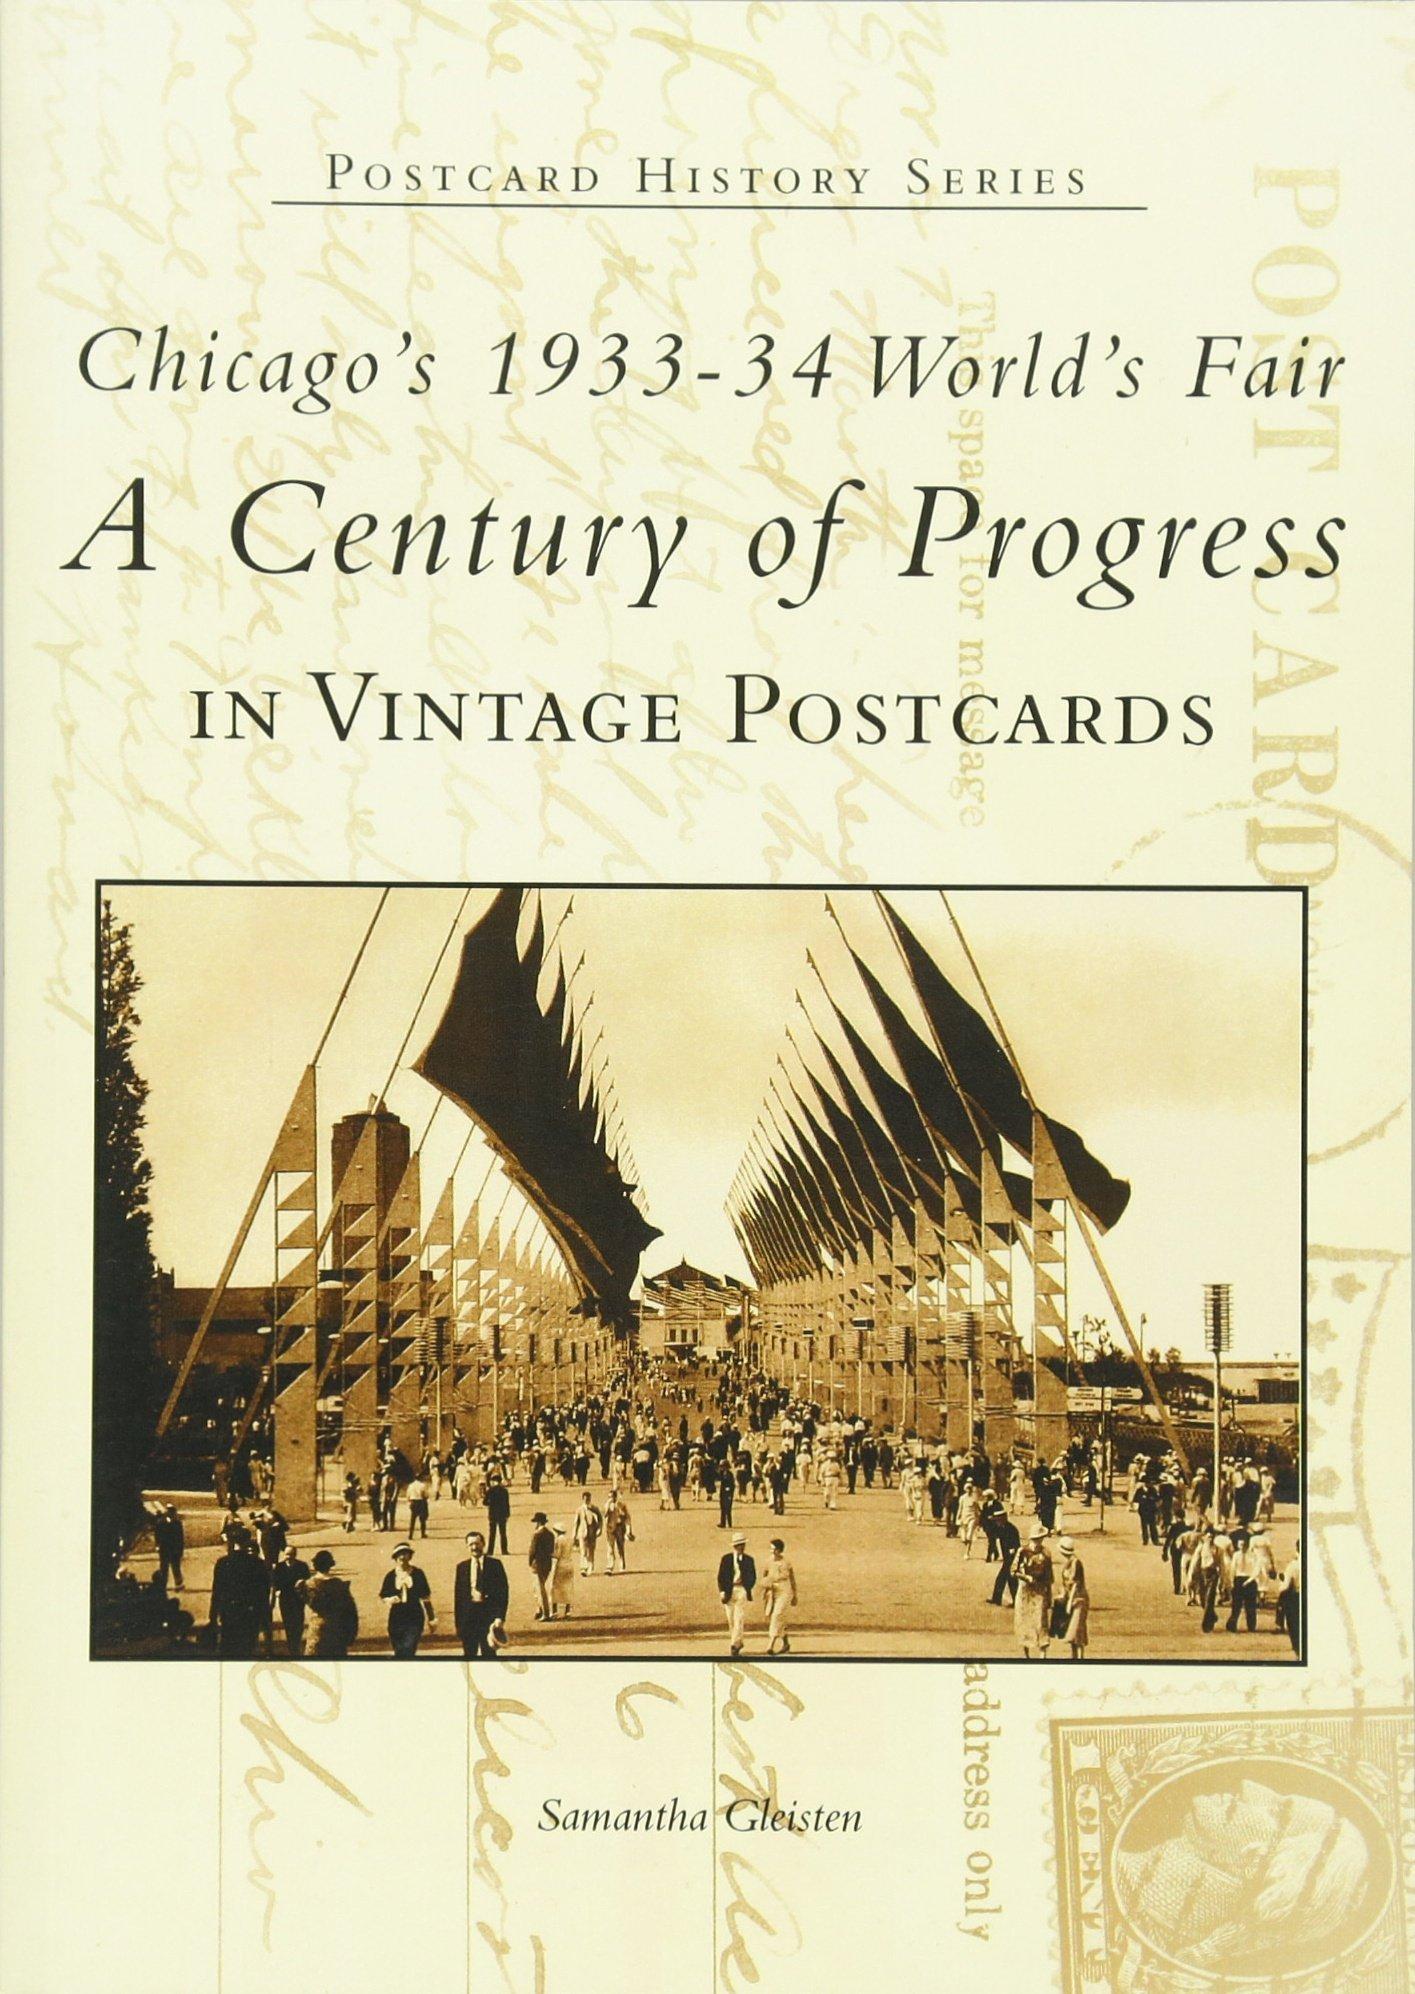 Chicago's 1933-34 World's Fair: A Century of Progress (IL) (Postcard History Series)